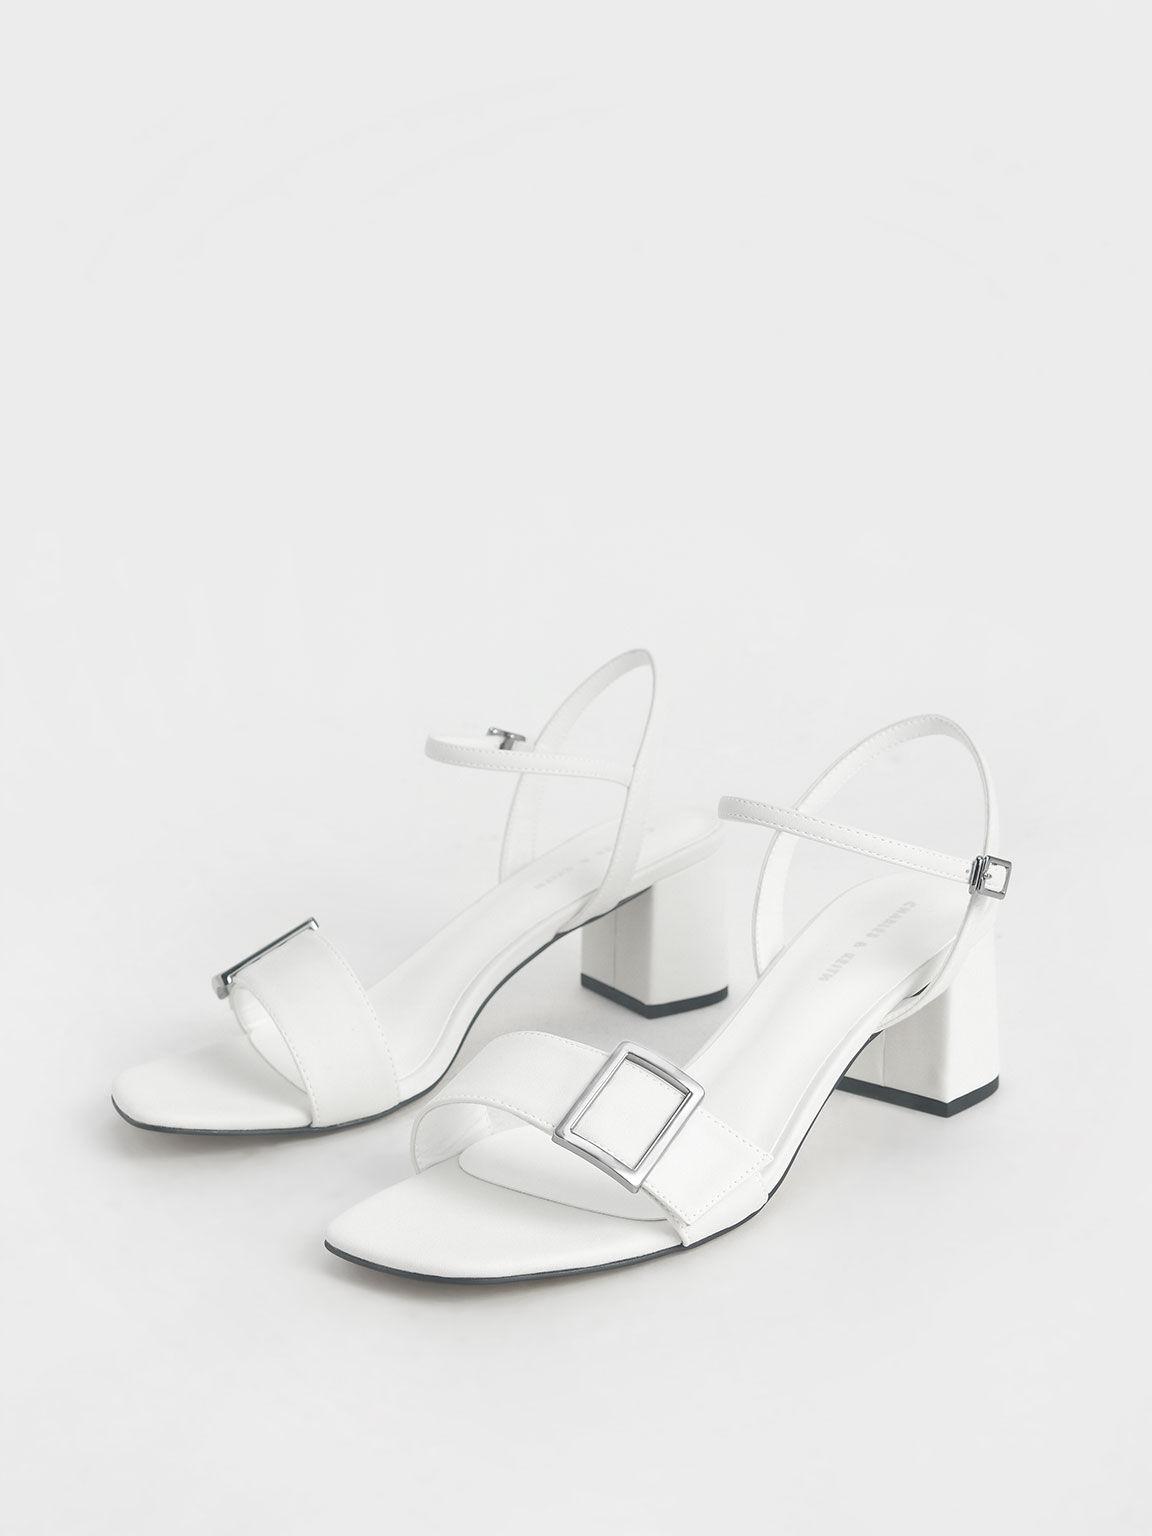 Buckle Strap Sandals, White, hi-res